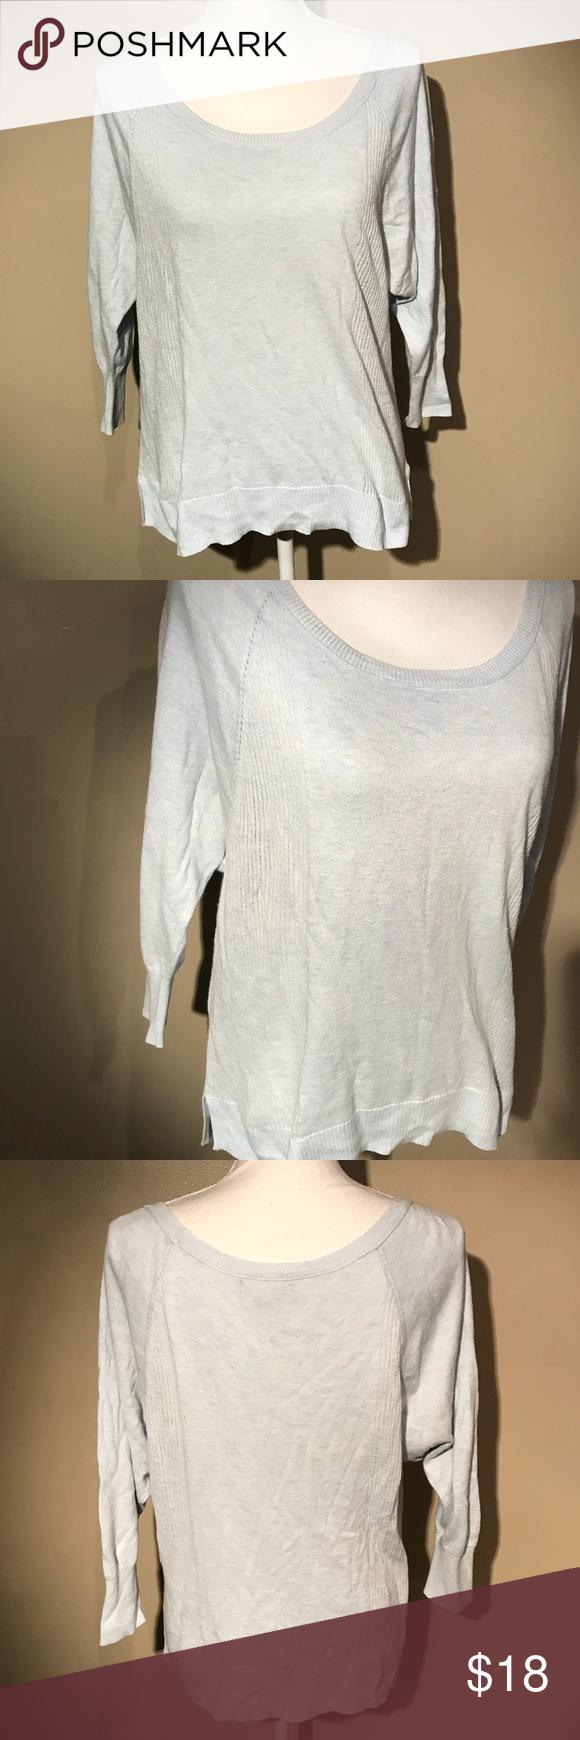 008028617 AE baby blue sweater в 2018 г.